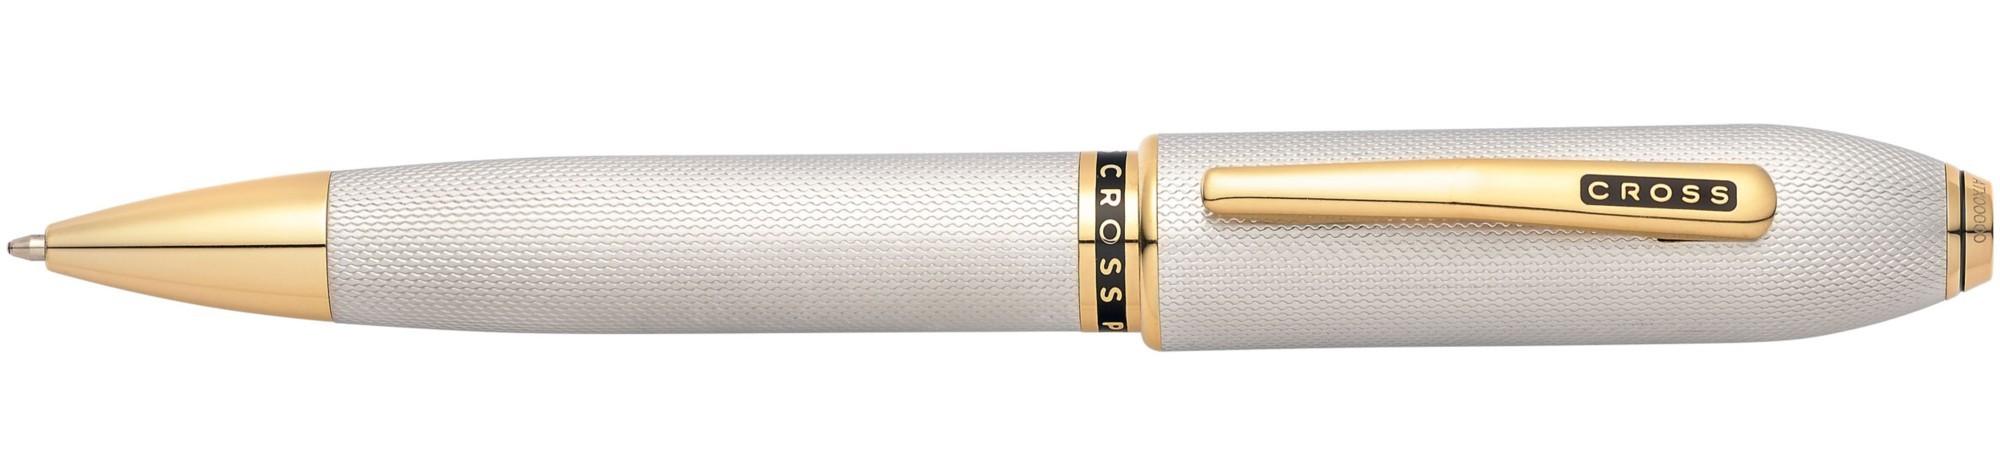 Шариковая ручка Cross Peerless Platinum Plate/Medalist